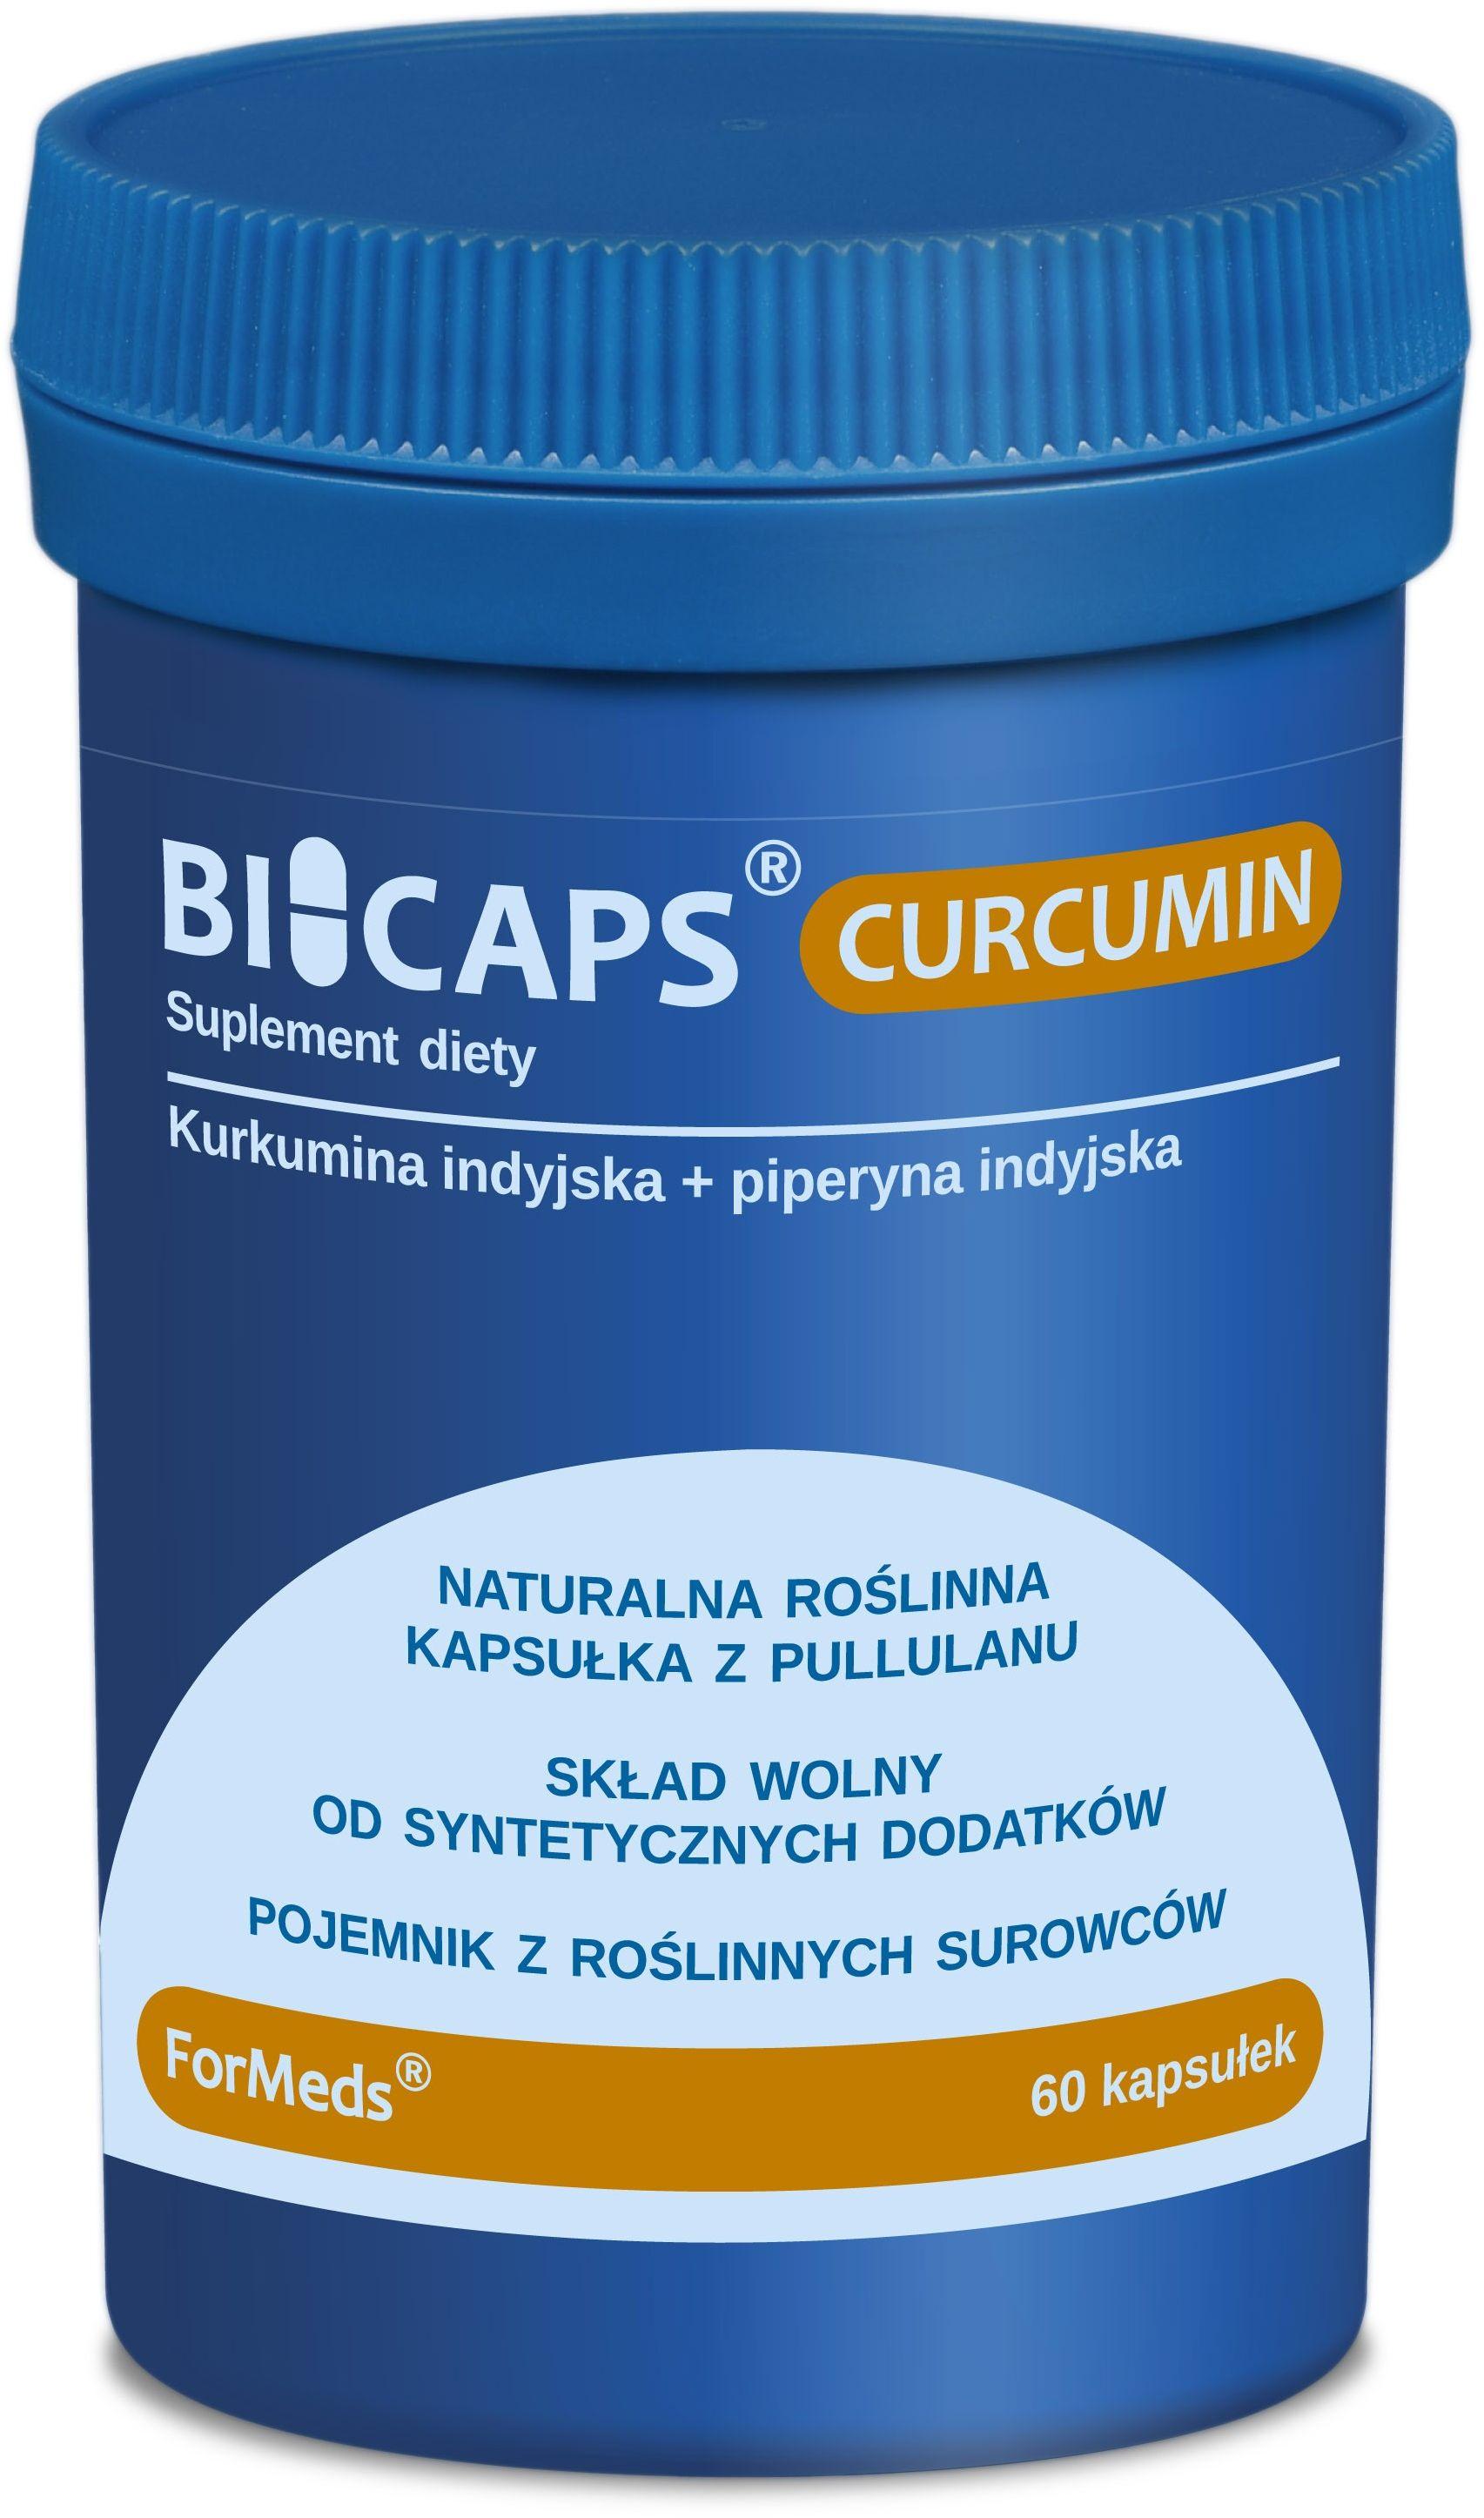 ForMeds Bicaps Curcumin (Kurkumina + Piperyna) 60 Kapsułek roślinnych